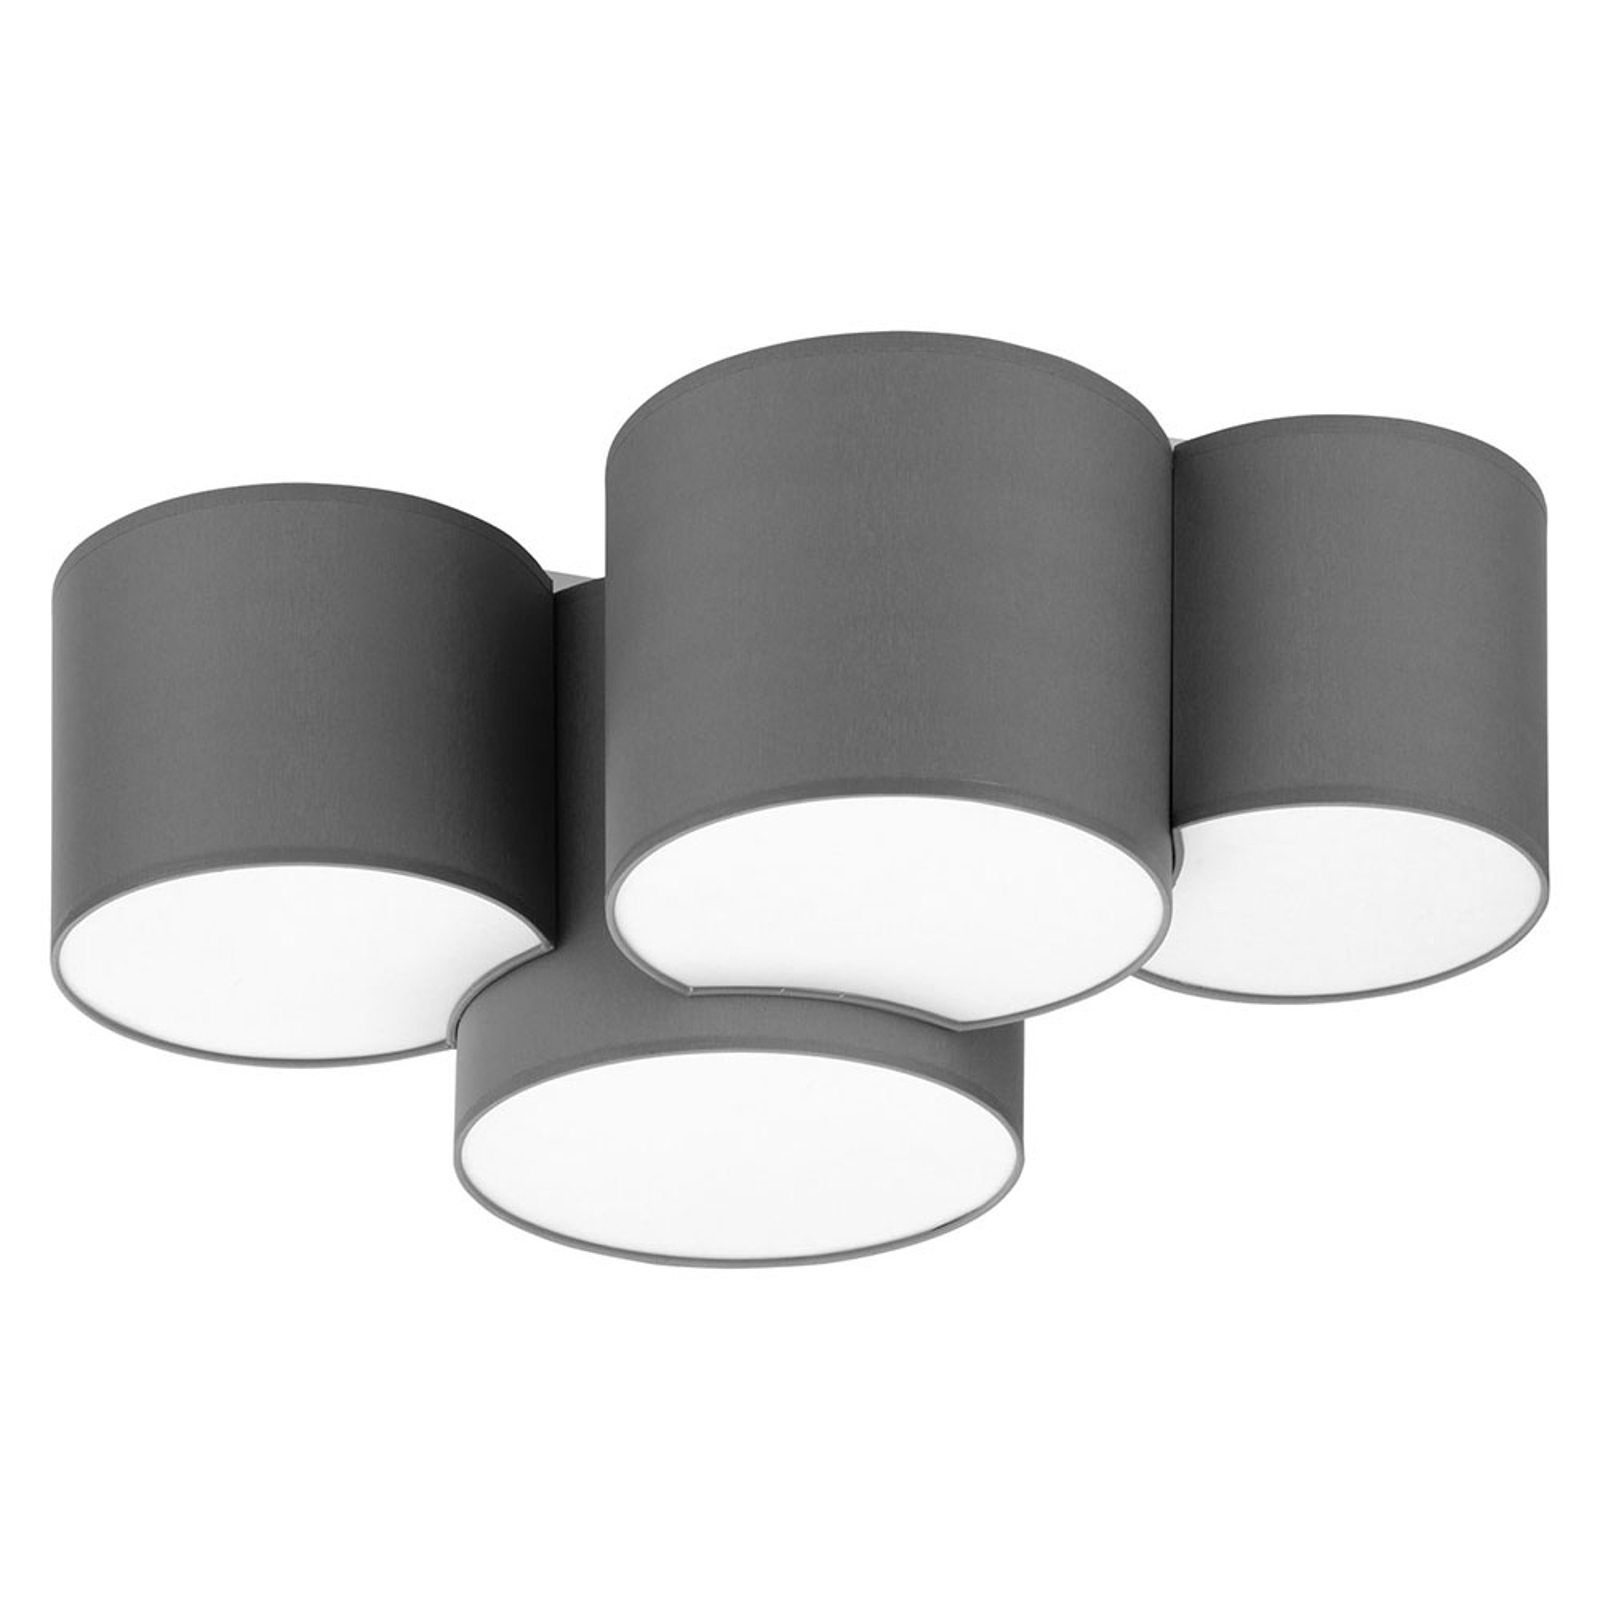 Taklampe Mona fire lyskilder, grå